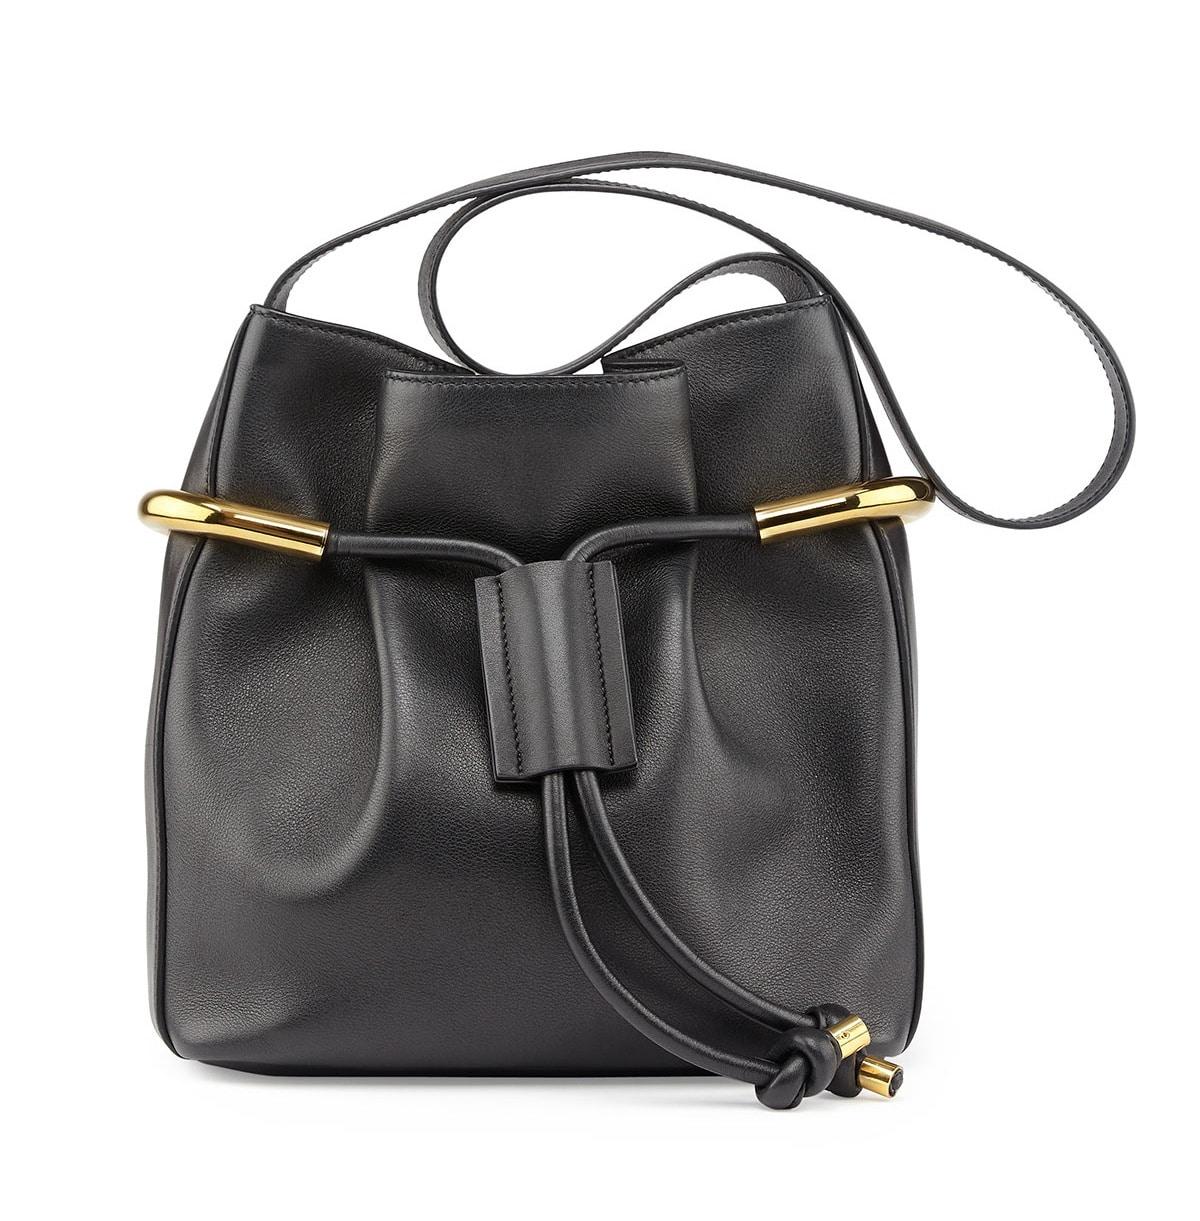 chloe replica bags - Chloe Emma Drawstring Bag Reference Guide | Spotted Fashion